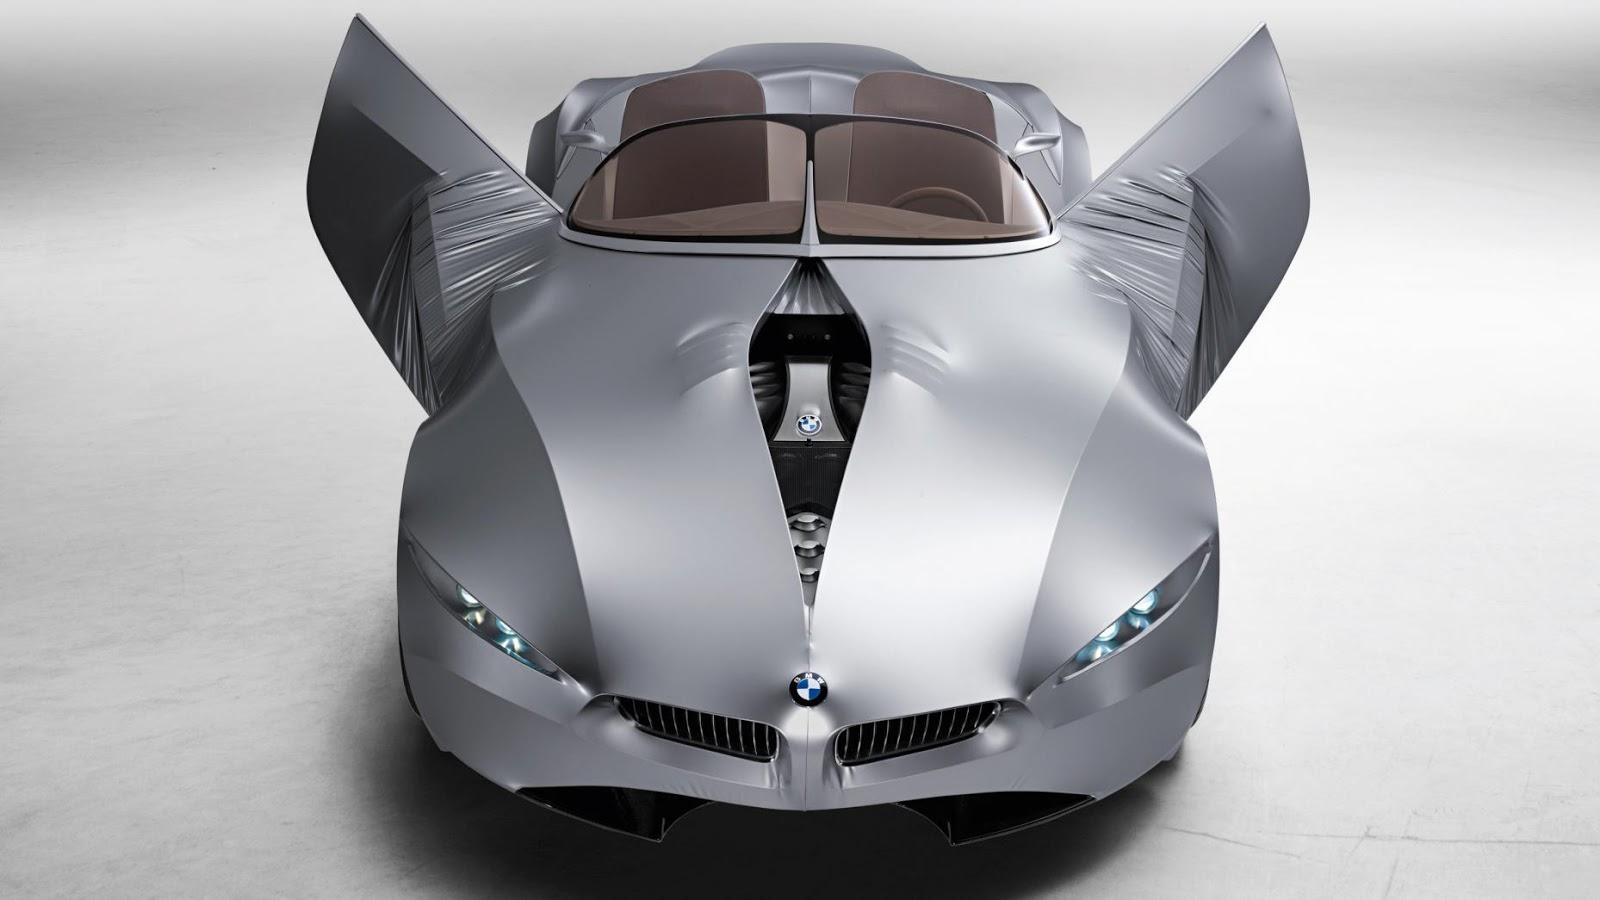 2008: BMW GINA Concept